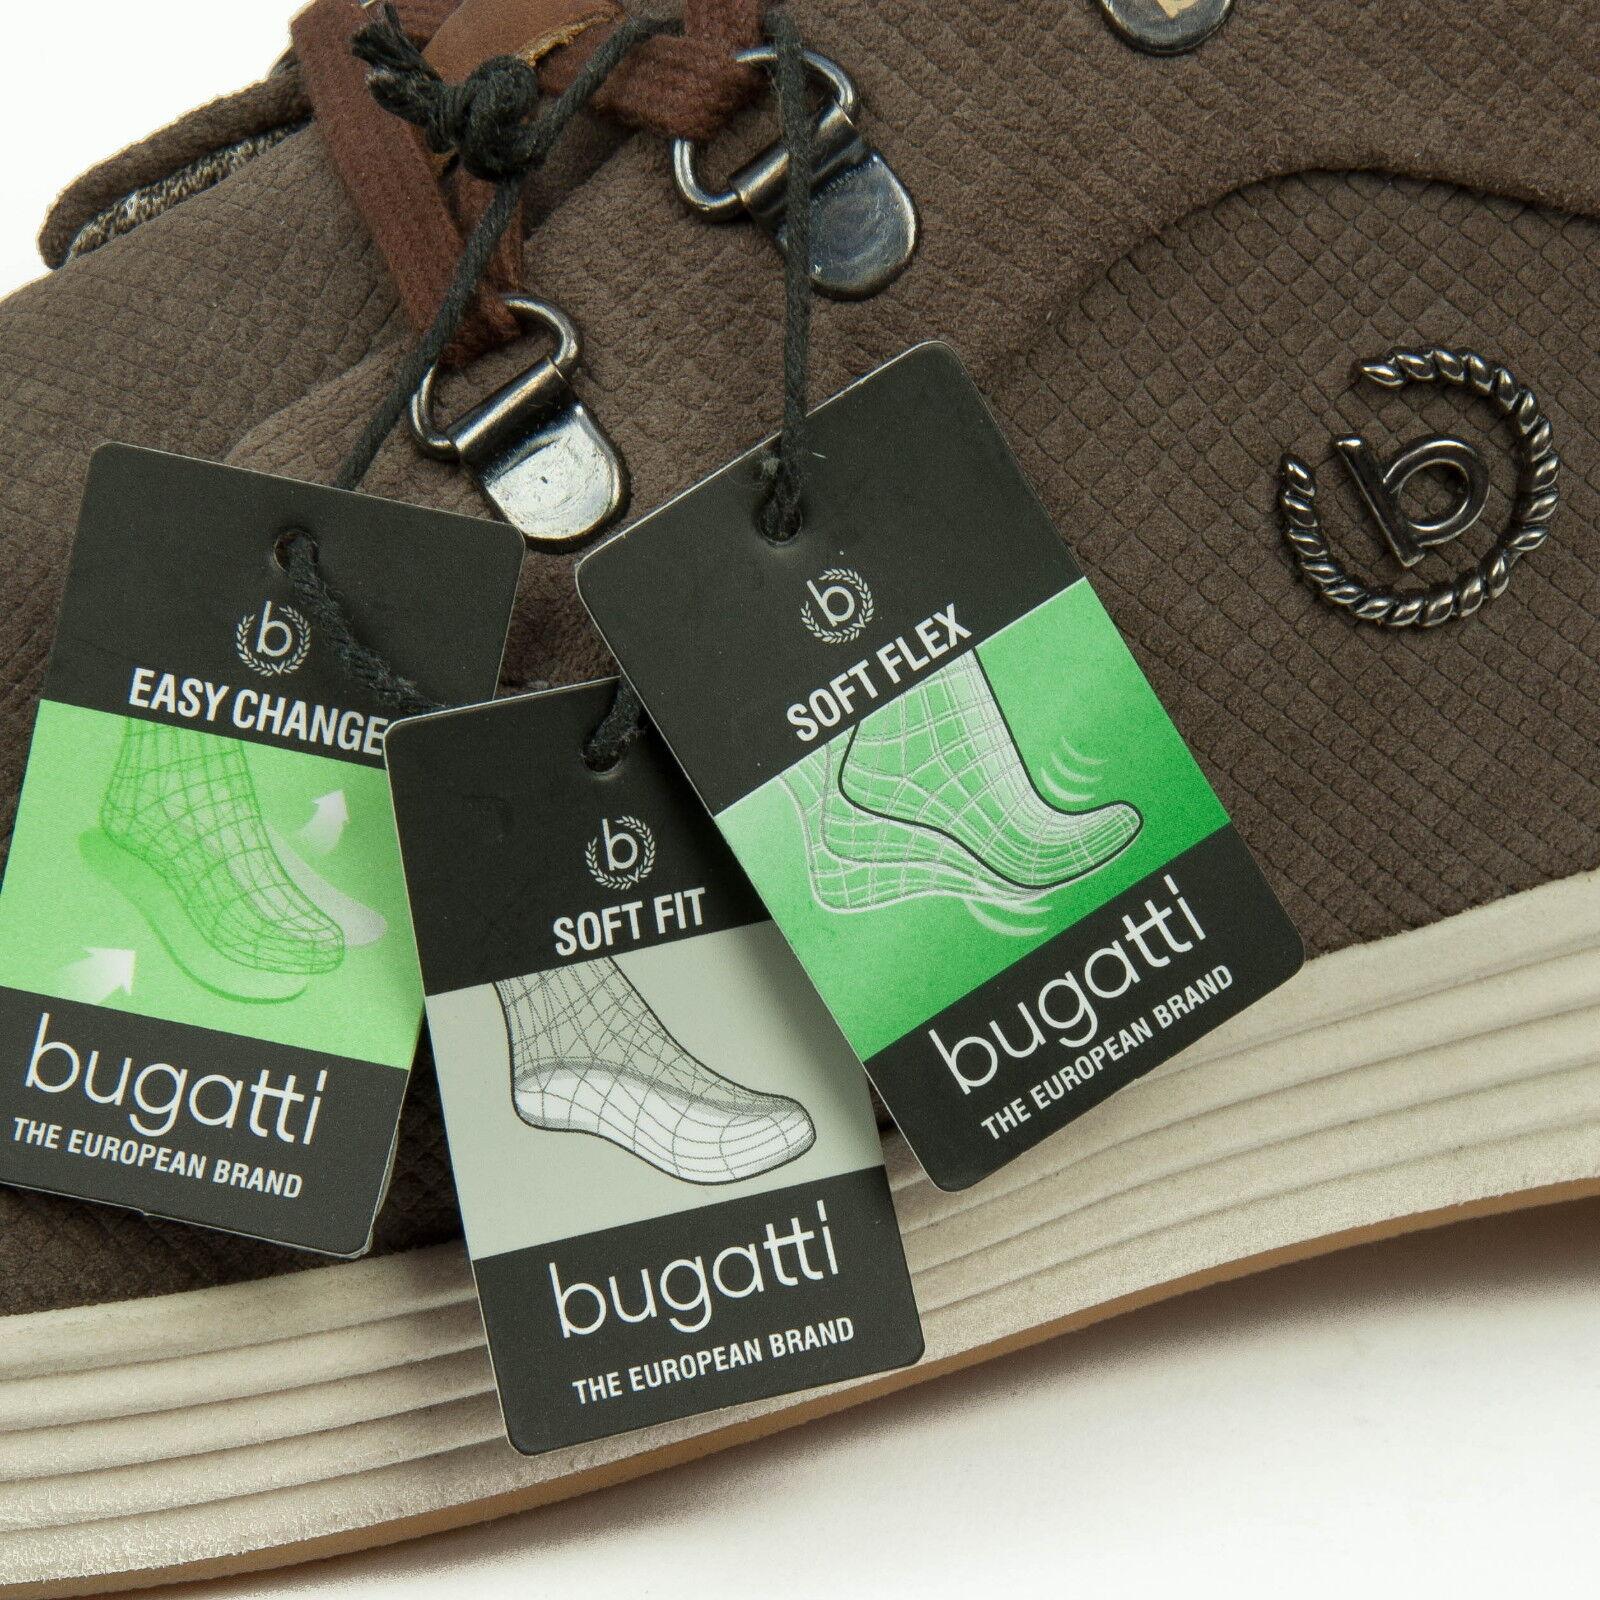 Bugatti Herrenschuhe Sneaker Schnürschuhe Leder Taupe 322-28401-1400-1400